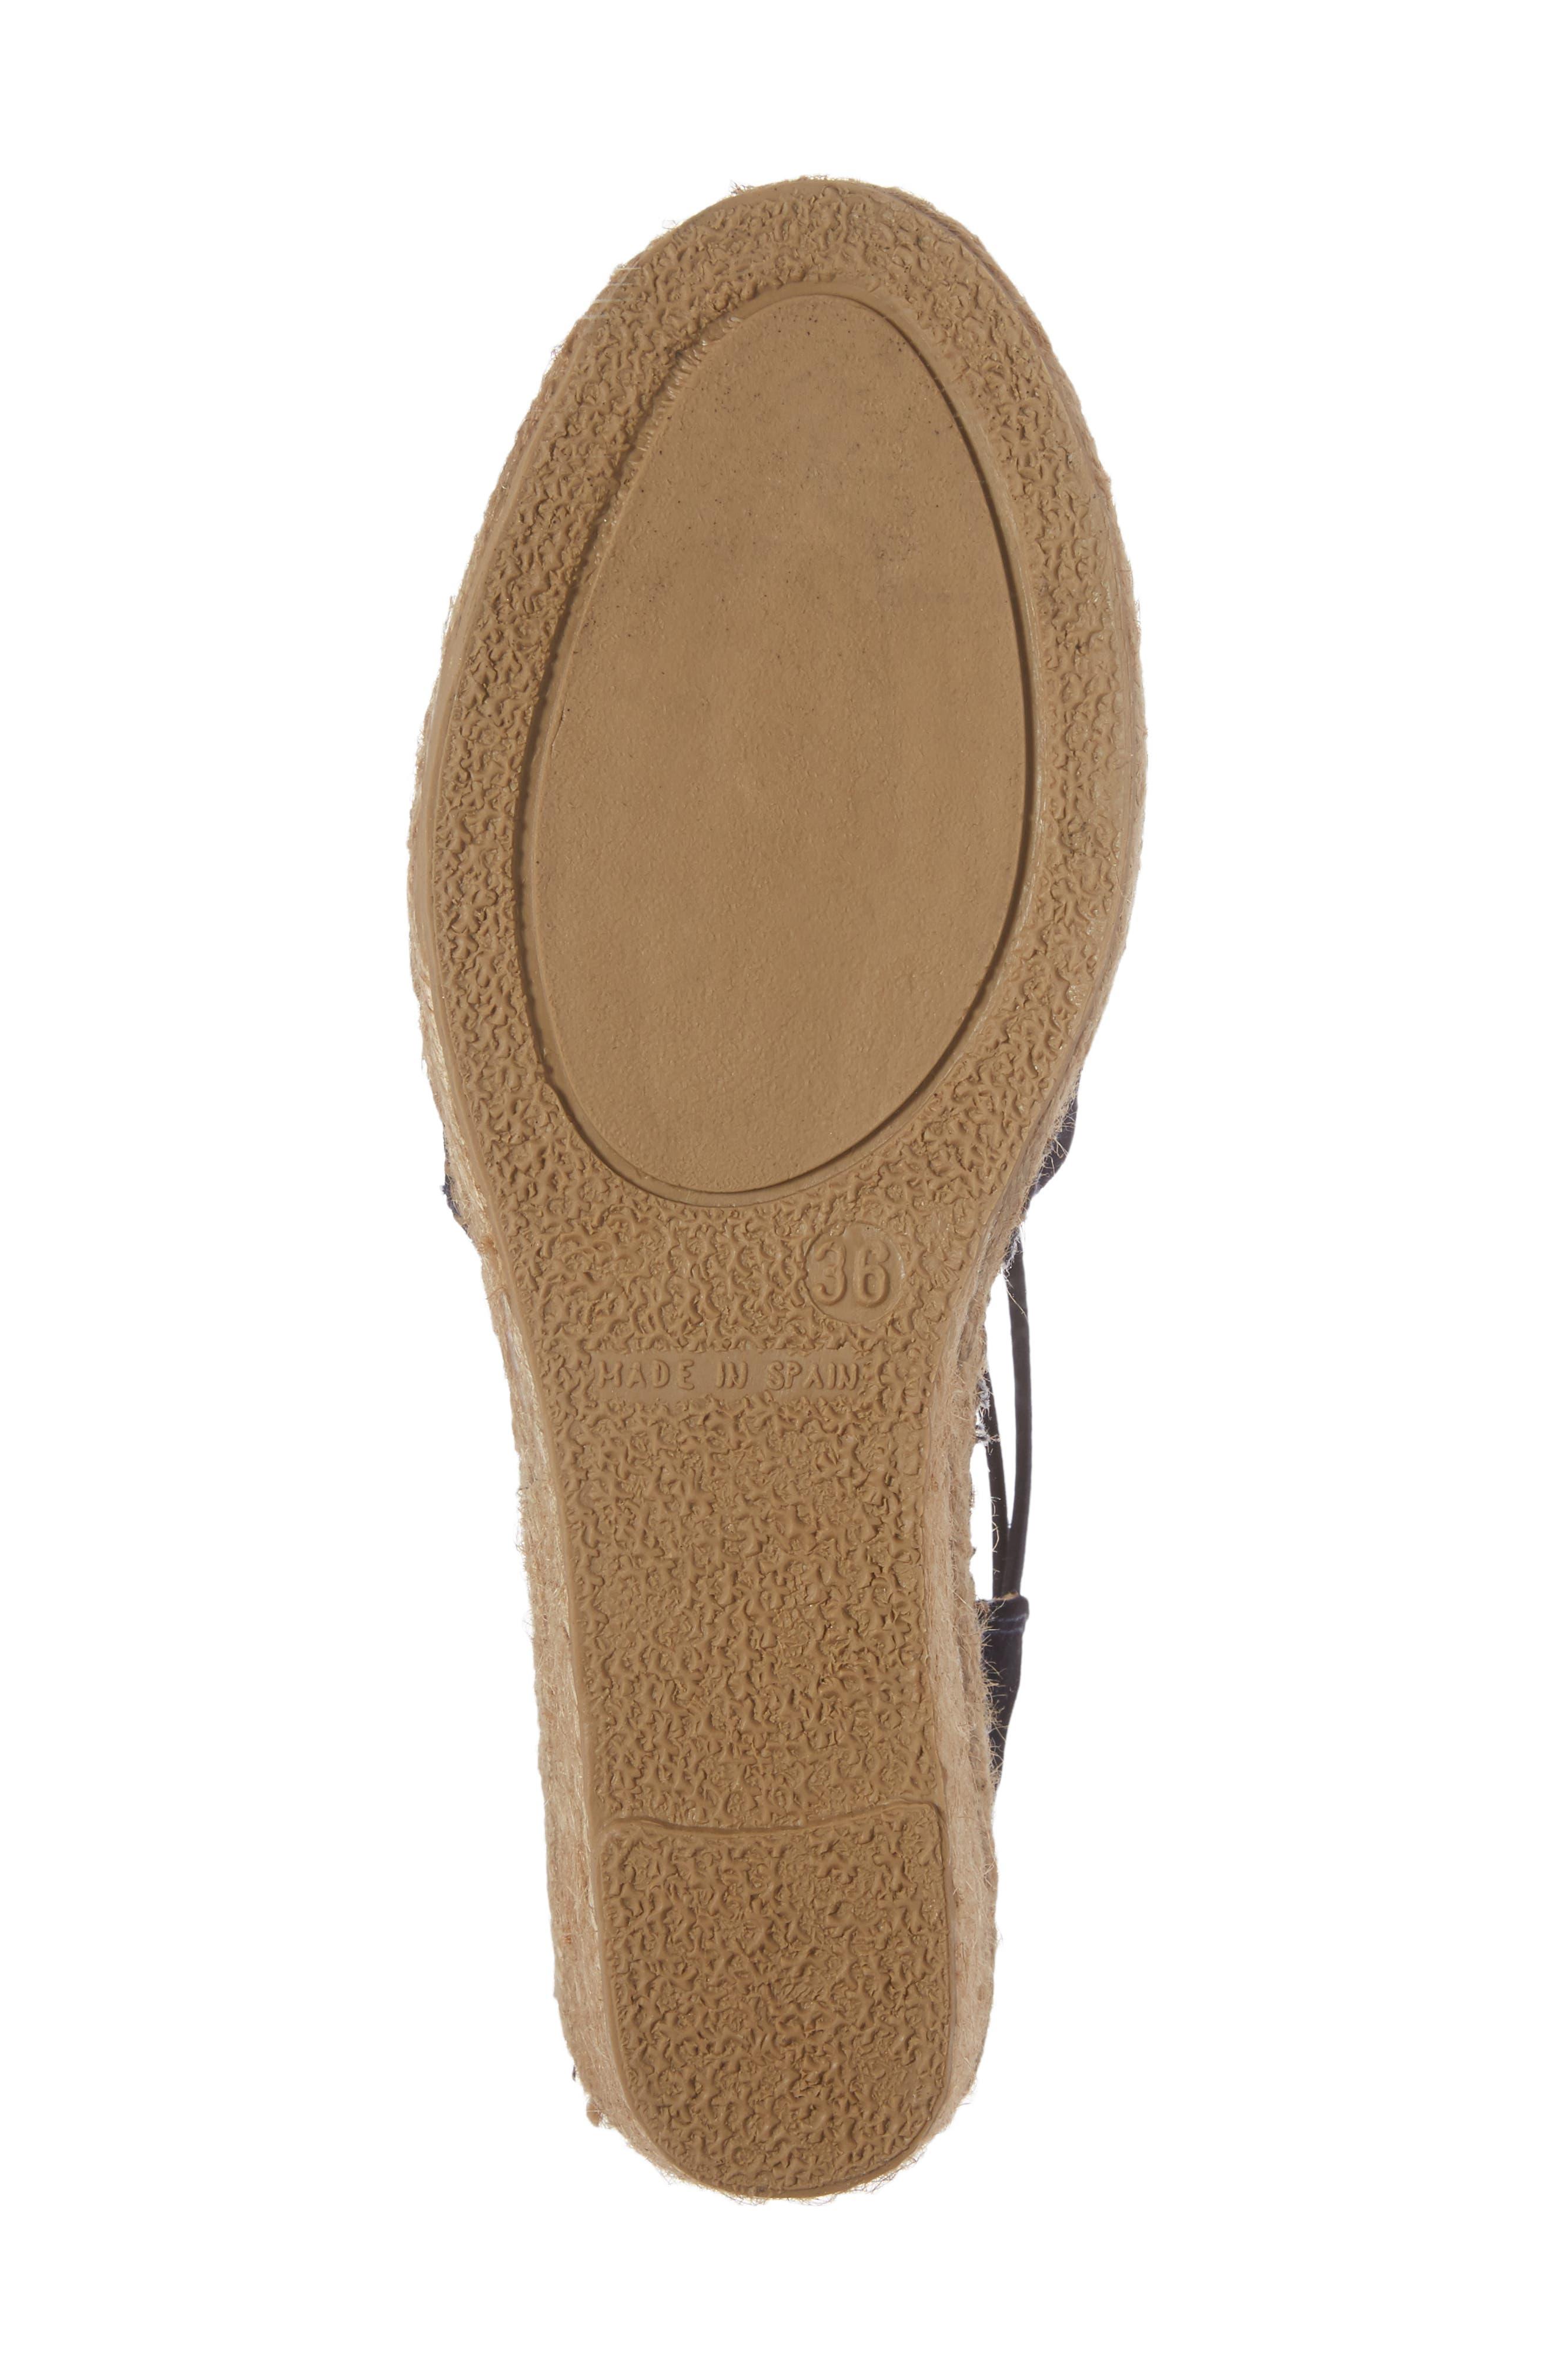 'Tremp' Slingback Espadrille Sandal,                             Alternate thumbnail 6, color,                             NAVY SUEDE